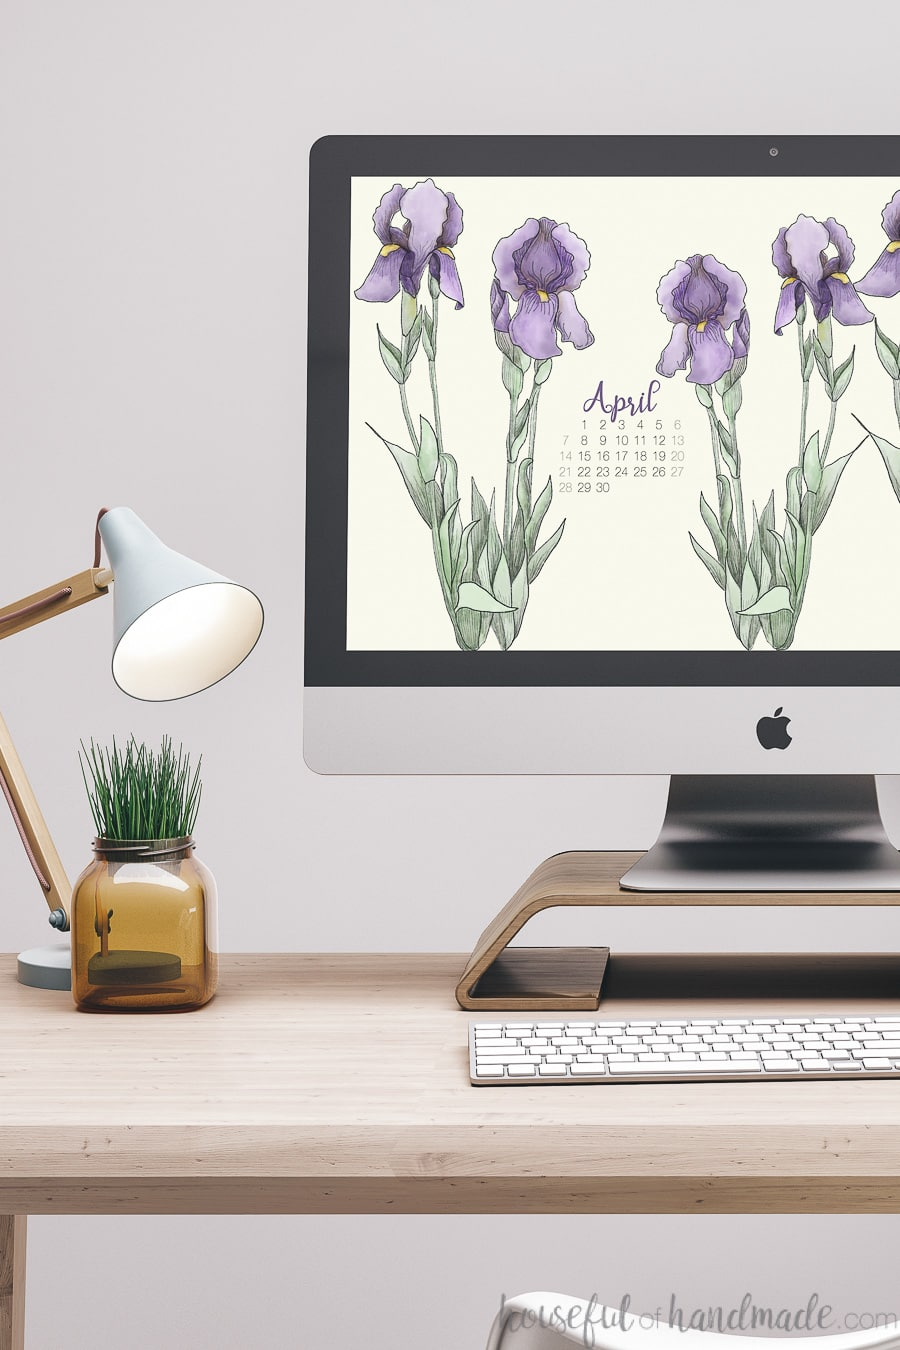 iMac computer with hand-drawn iris digital wallpaper on the screen.